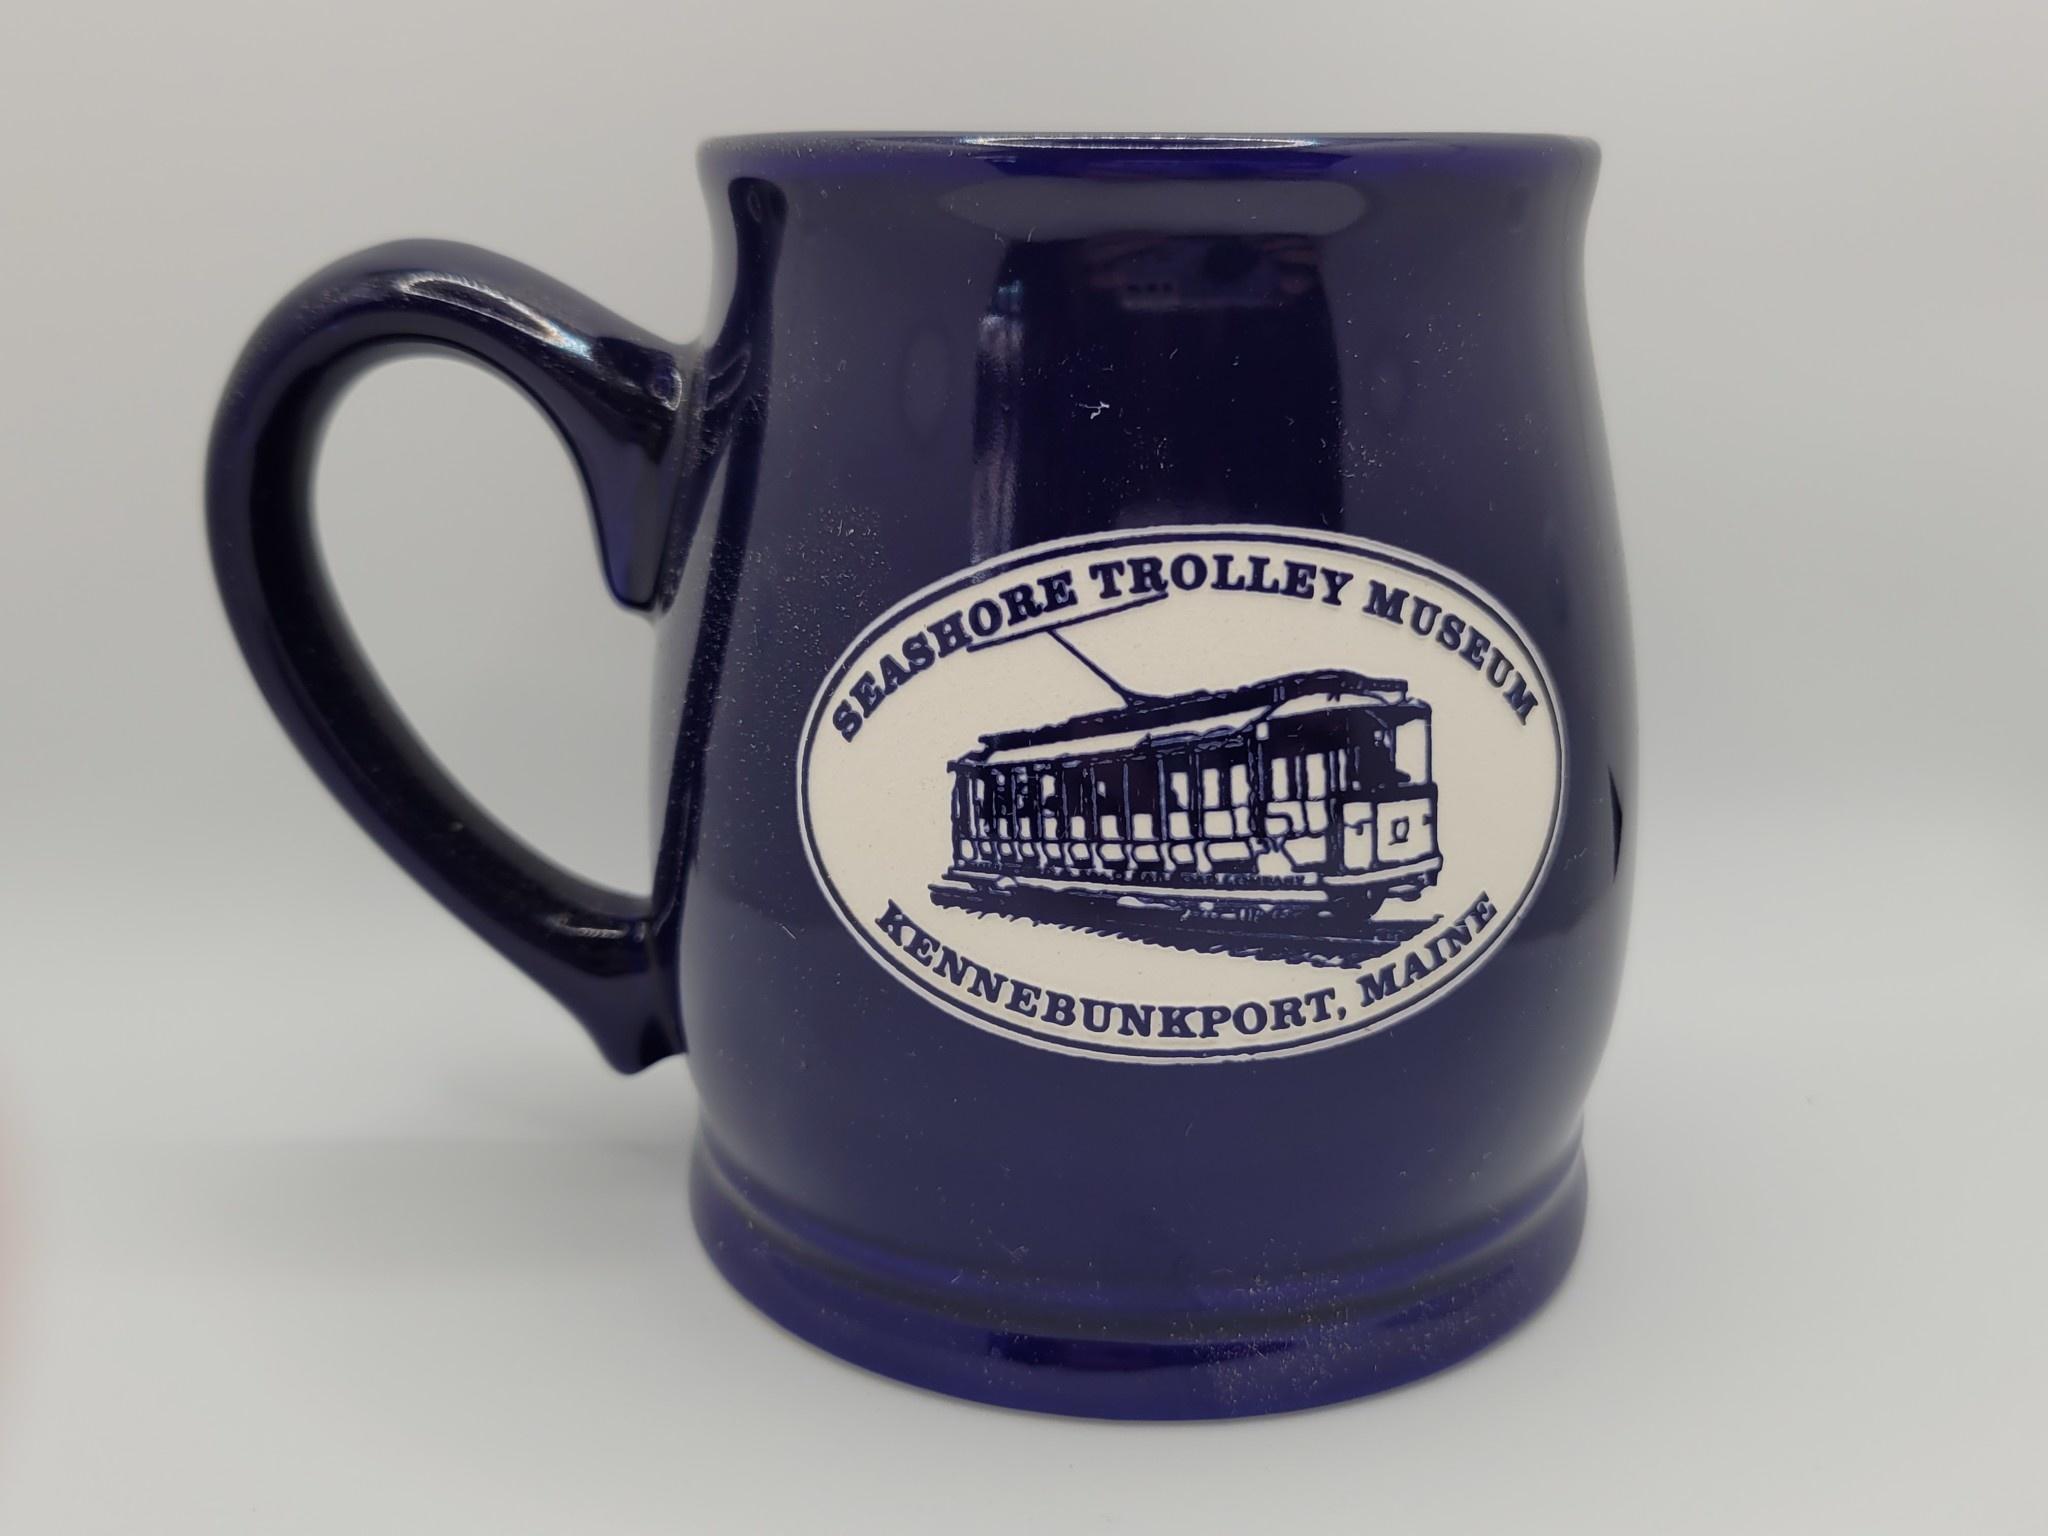 American Crystal Tankard Mug Solid Cobalt